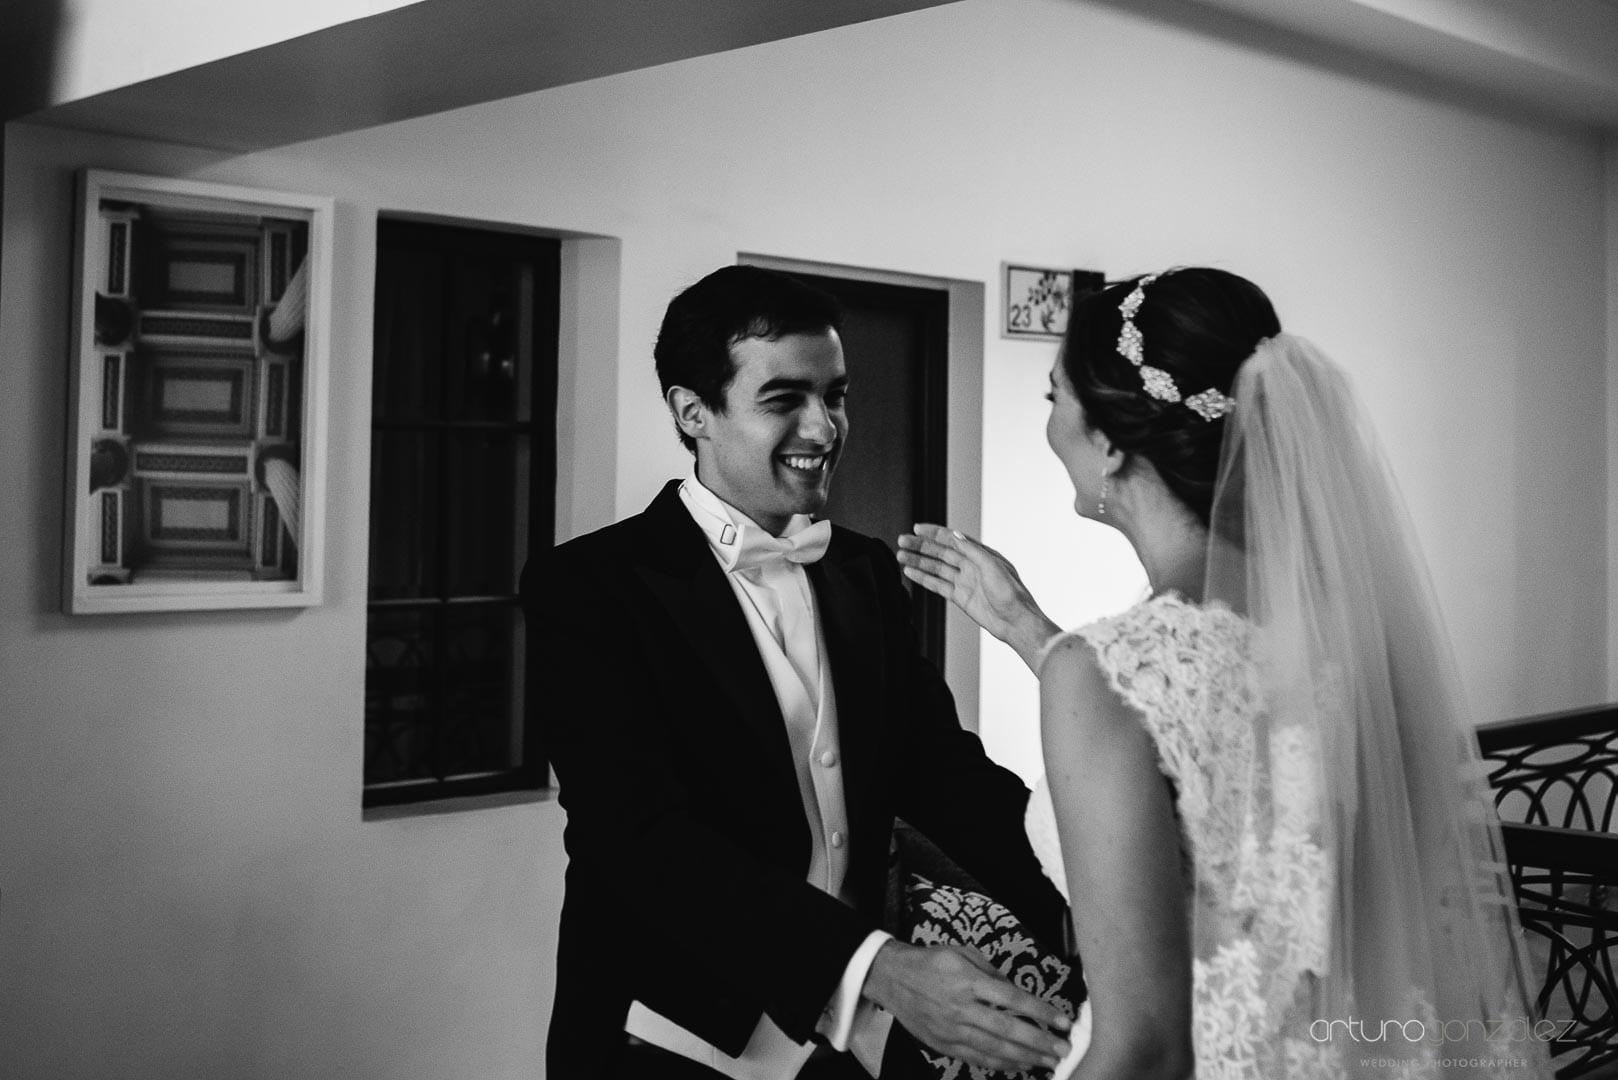 fotografo-de-bodas-en-guanajuato-21